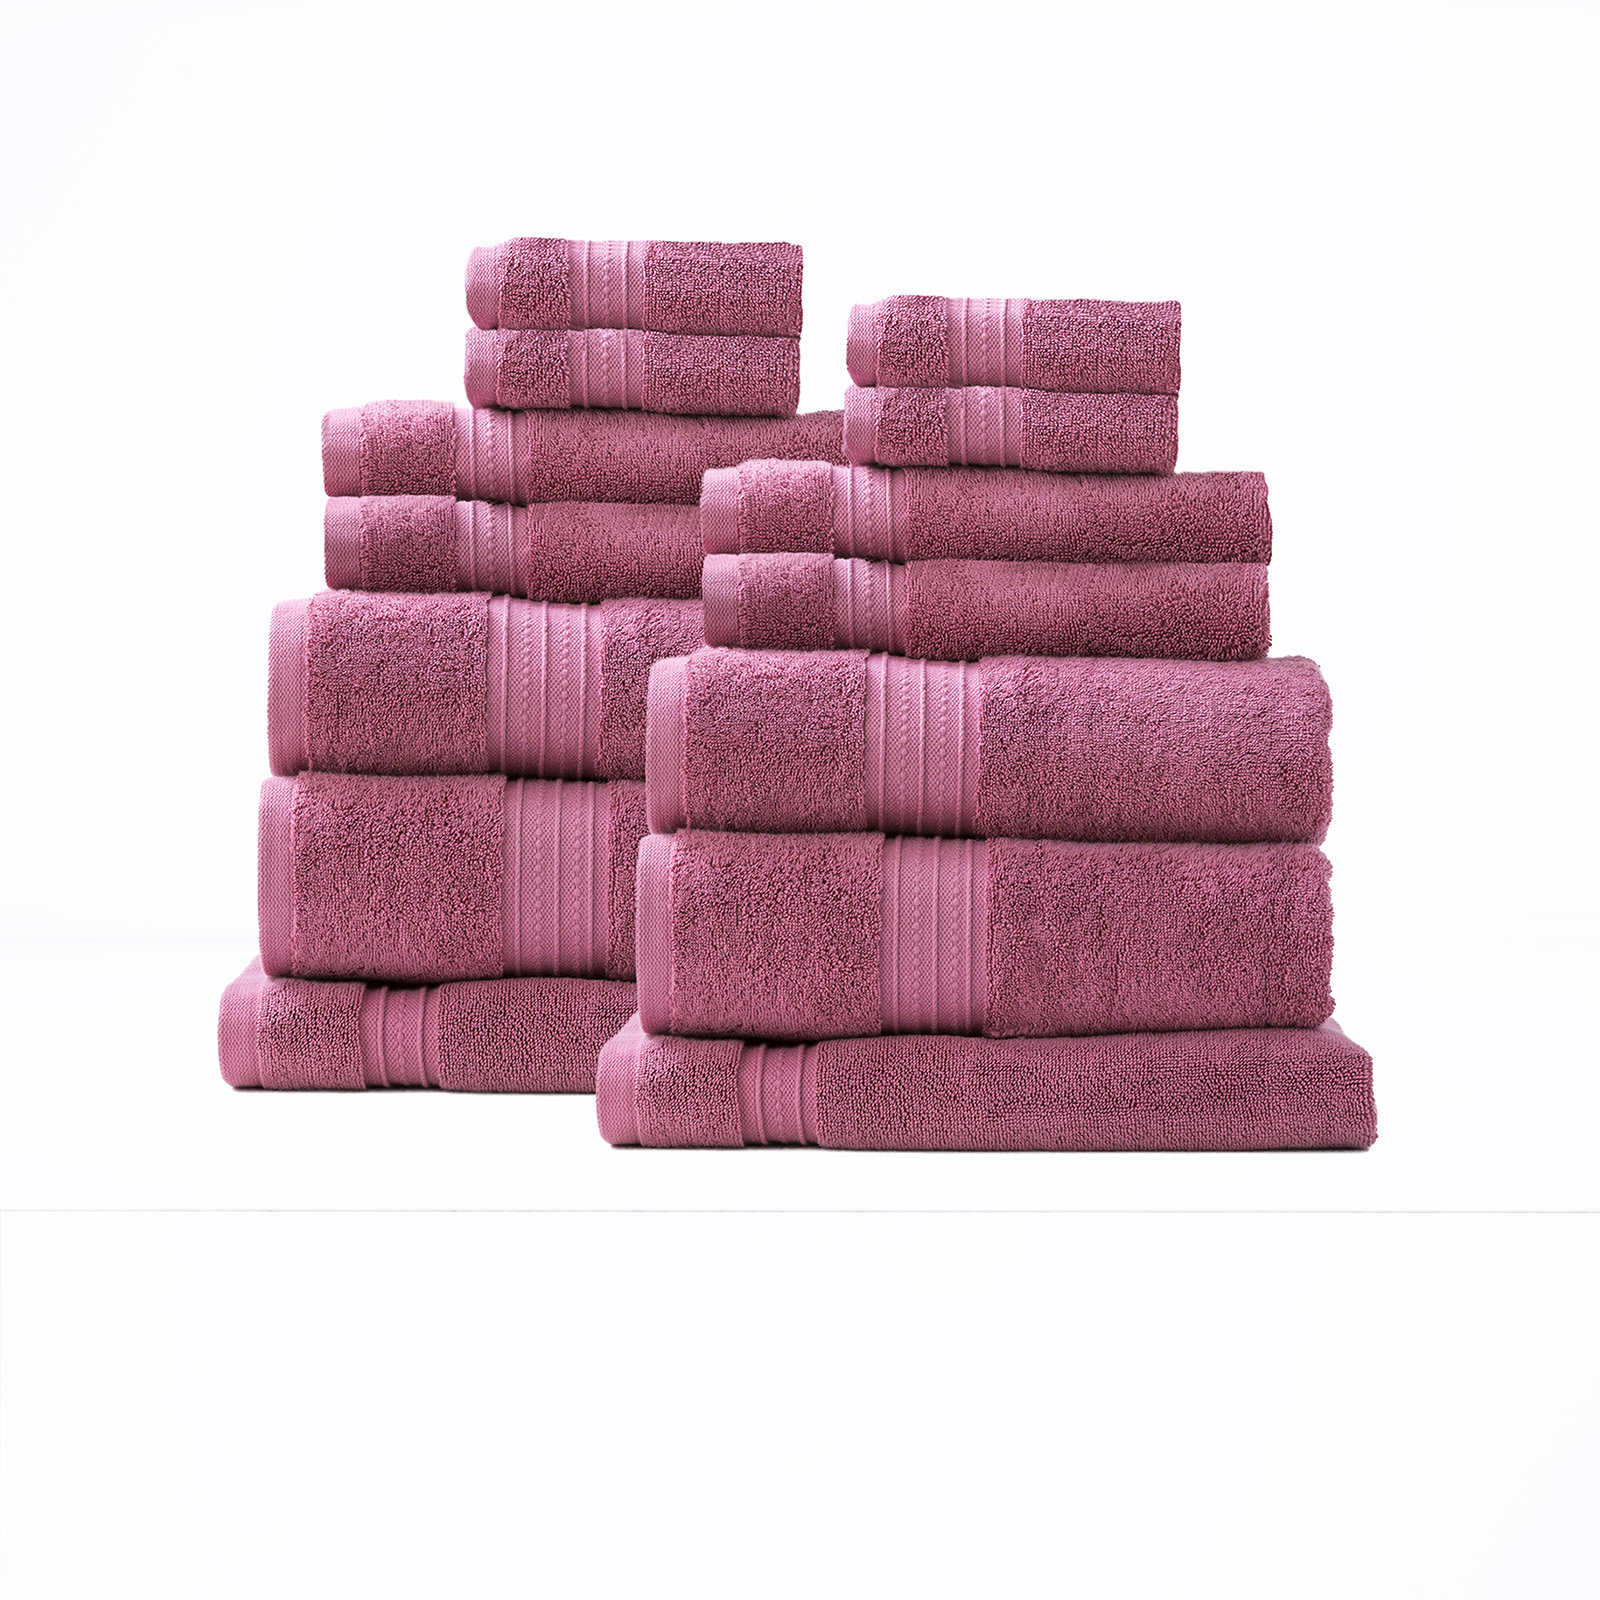 14 Piece Combed Cotton Zero Twist Towels 650 gsm | Rose Bud